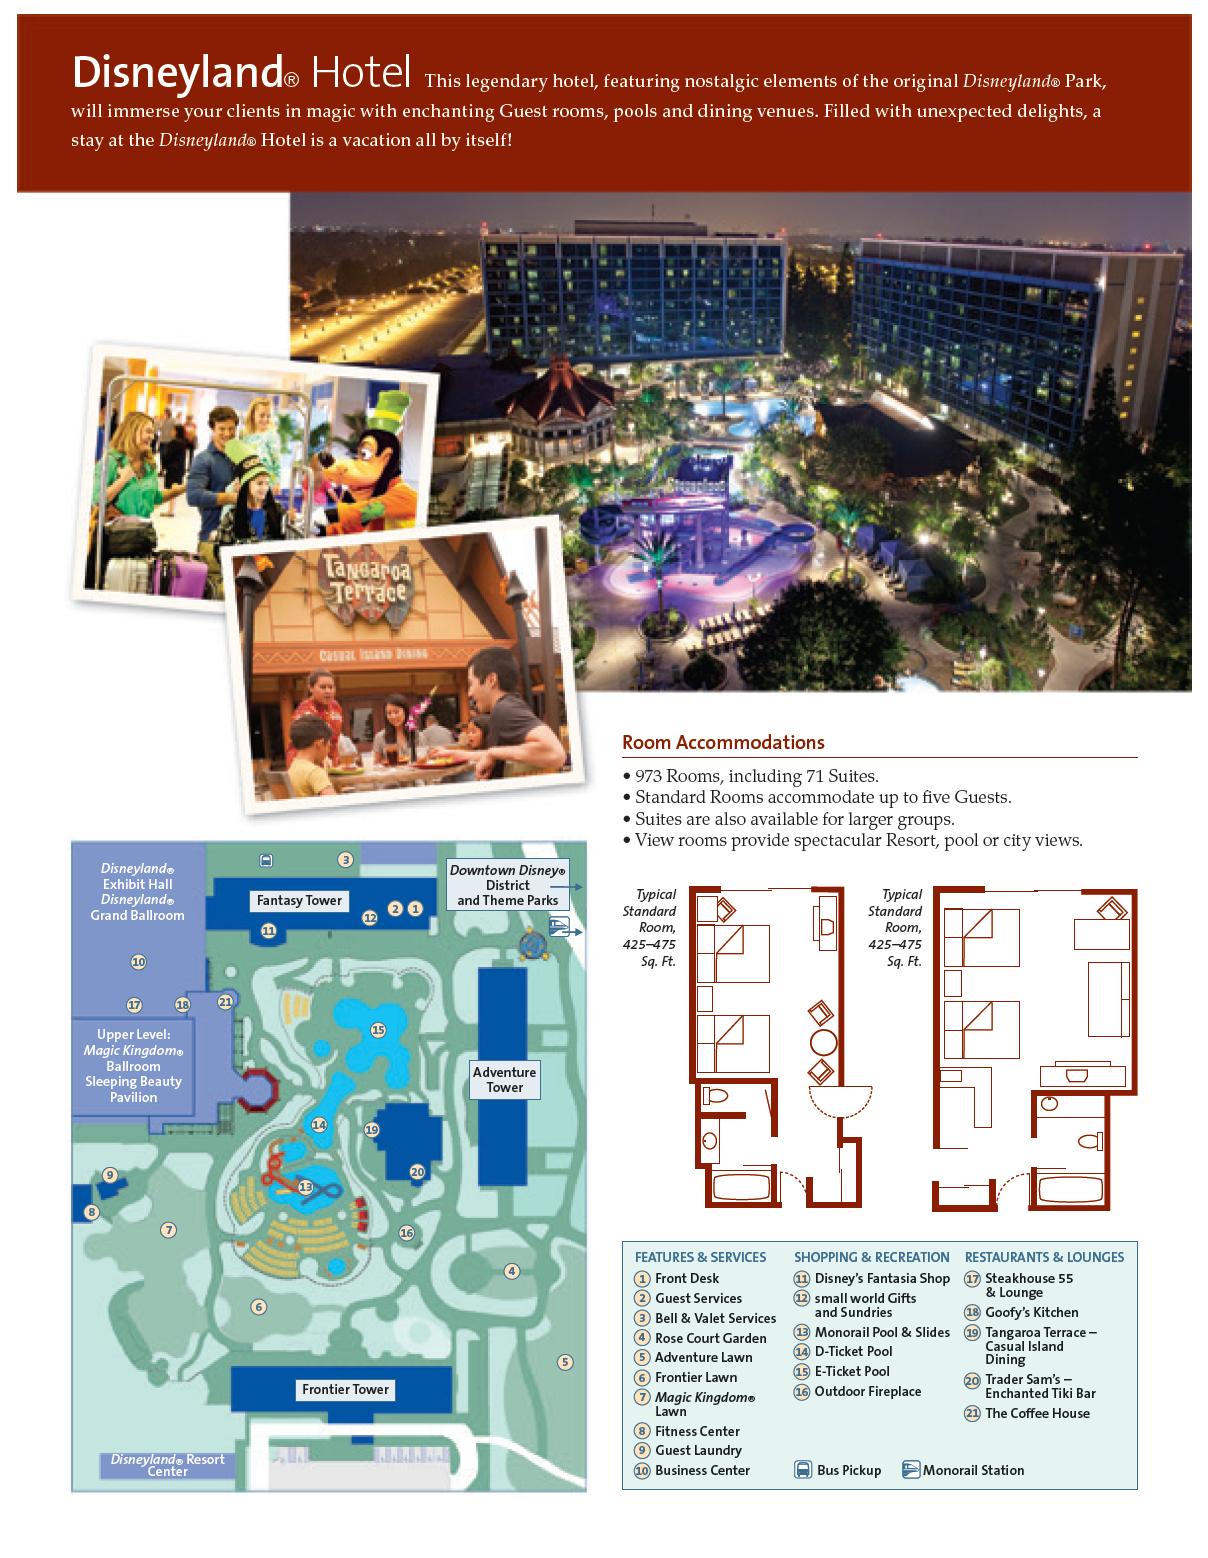 Disneyland Hotel Pg 1 California Guests Will Enjoy This Original